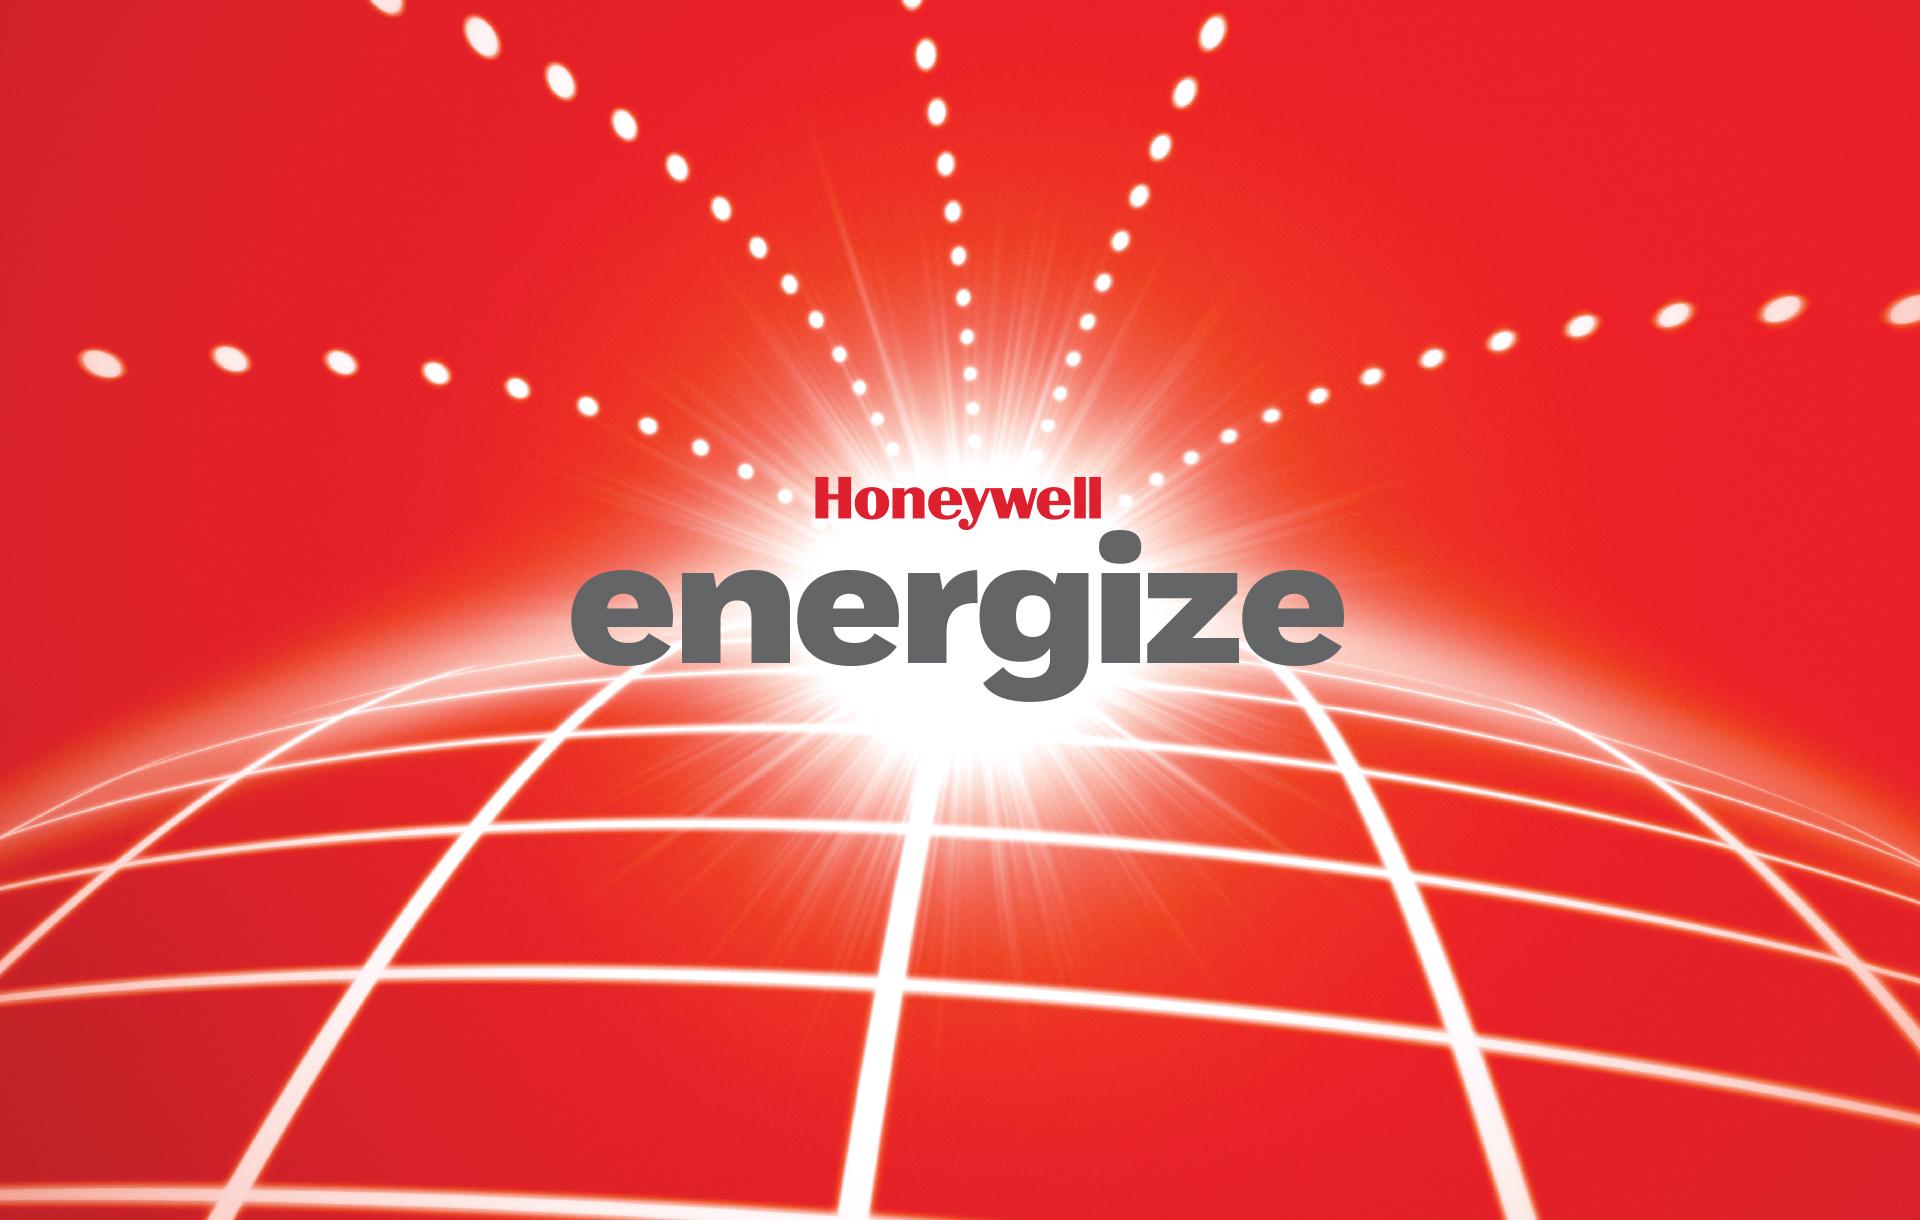 Cover_Energize16_HON_051519.jpg